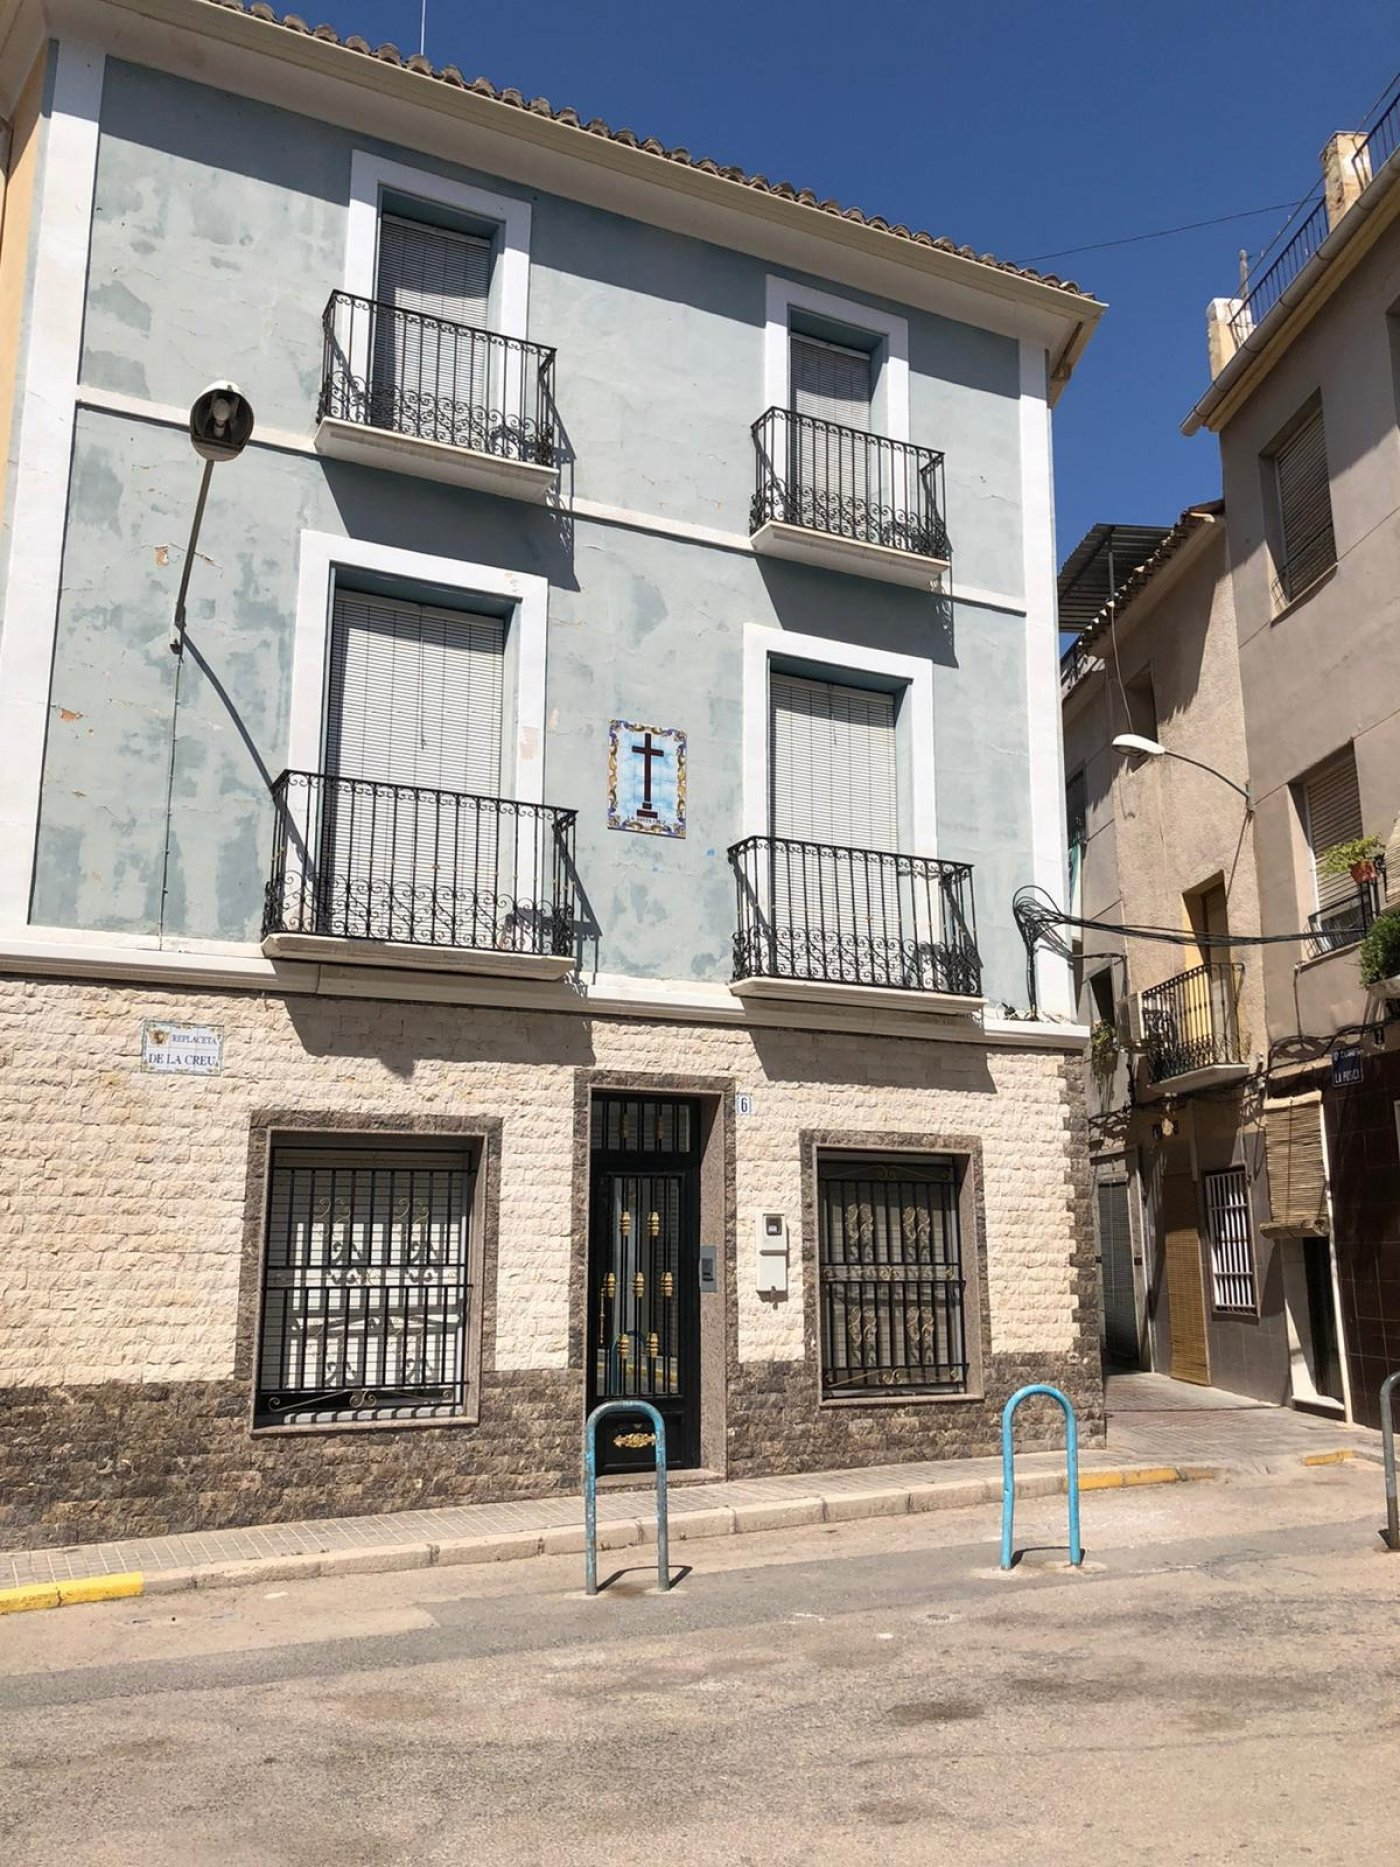 House for sale in Iglesia san pedro-ayuntamiento, Novelda